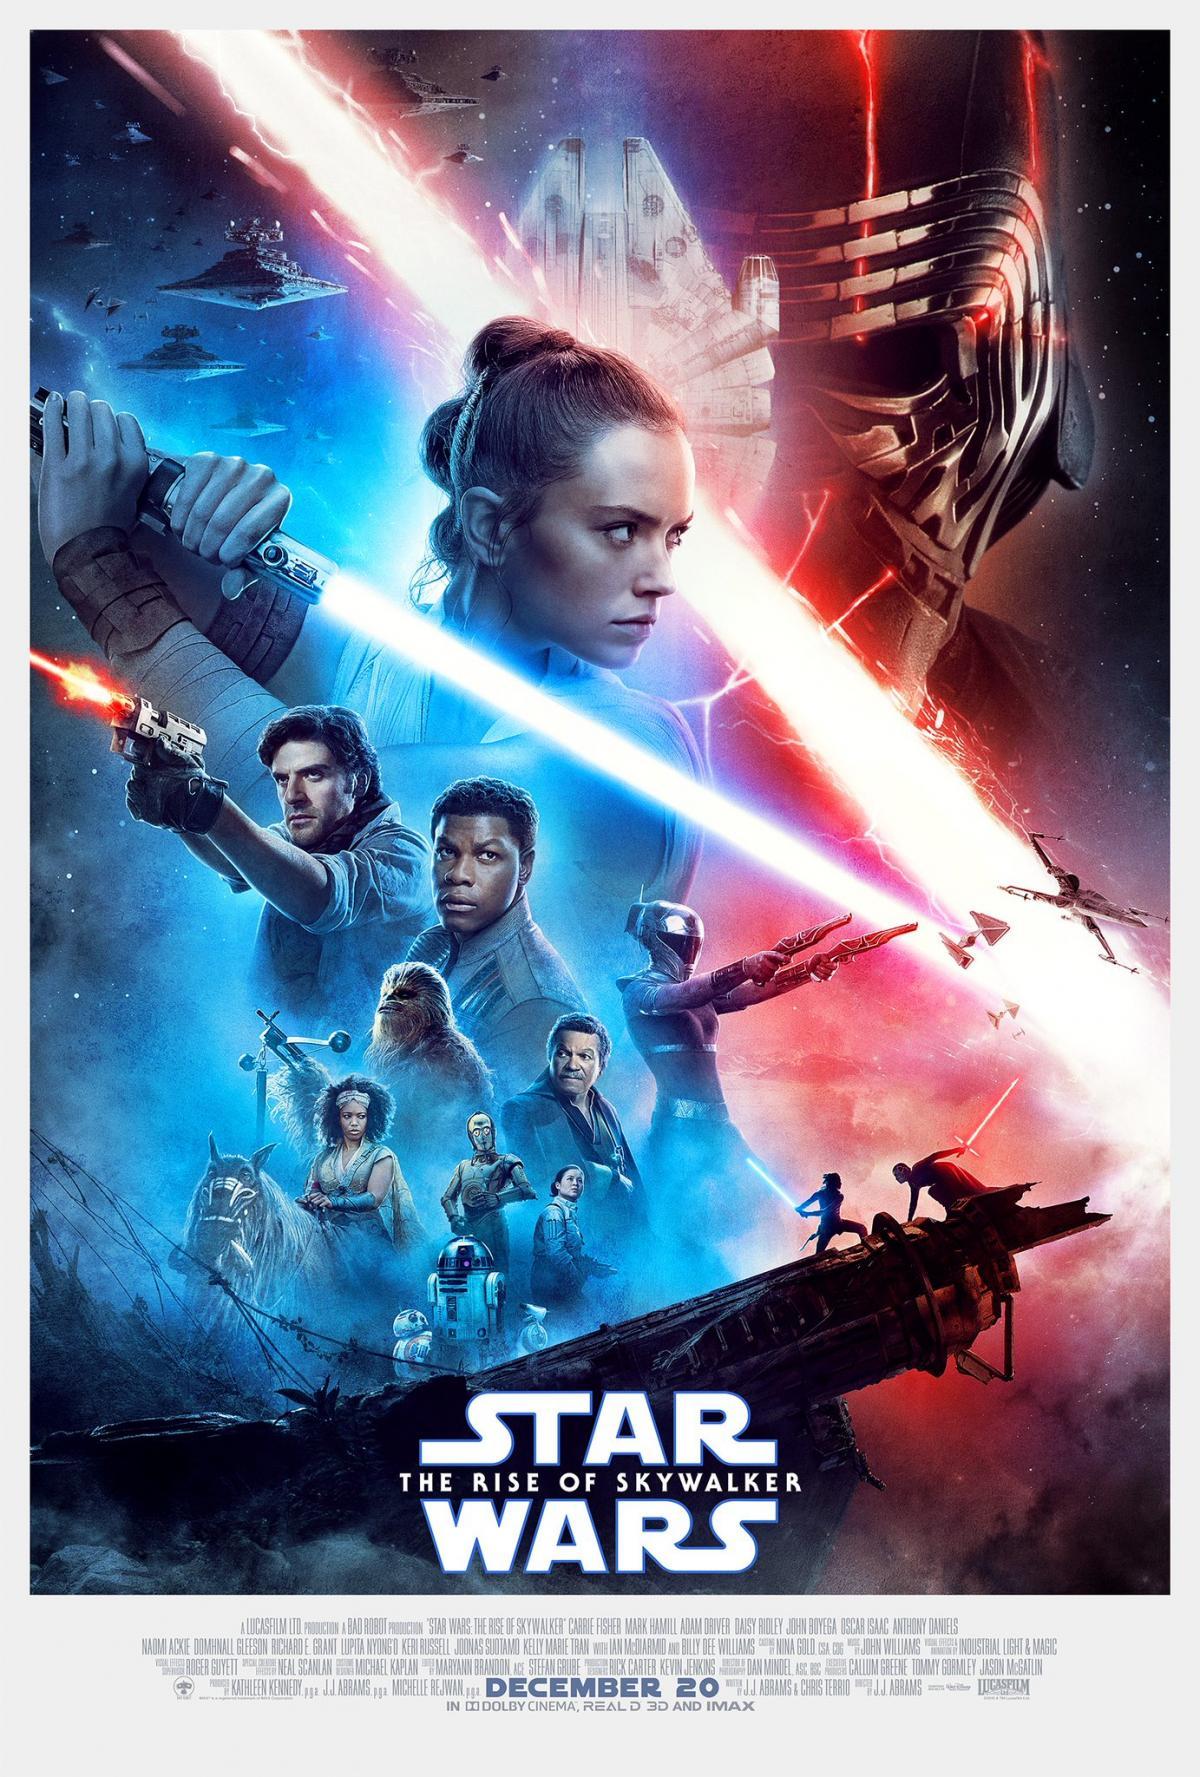 Nombre:  poster-star-wars-episodio-ix-ascenso-skywalker.jpg Visitas: 498 Tamaño: 338.2 KB